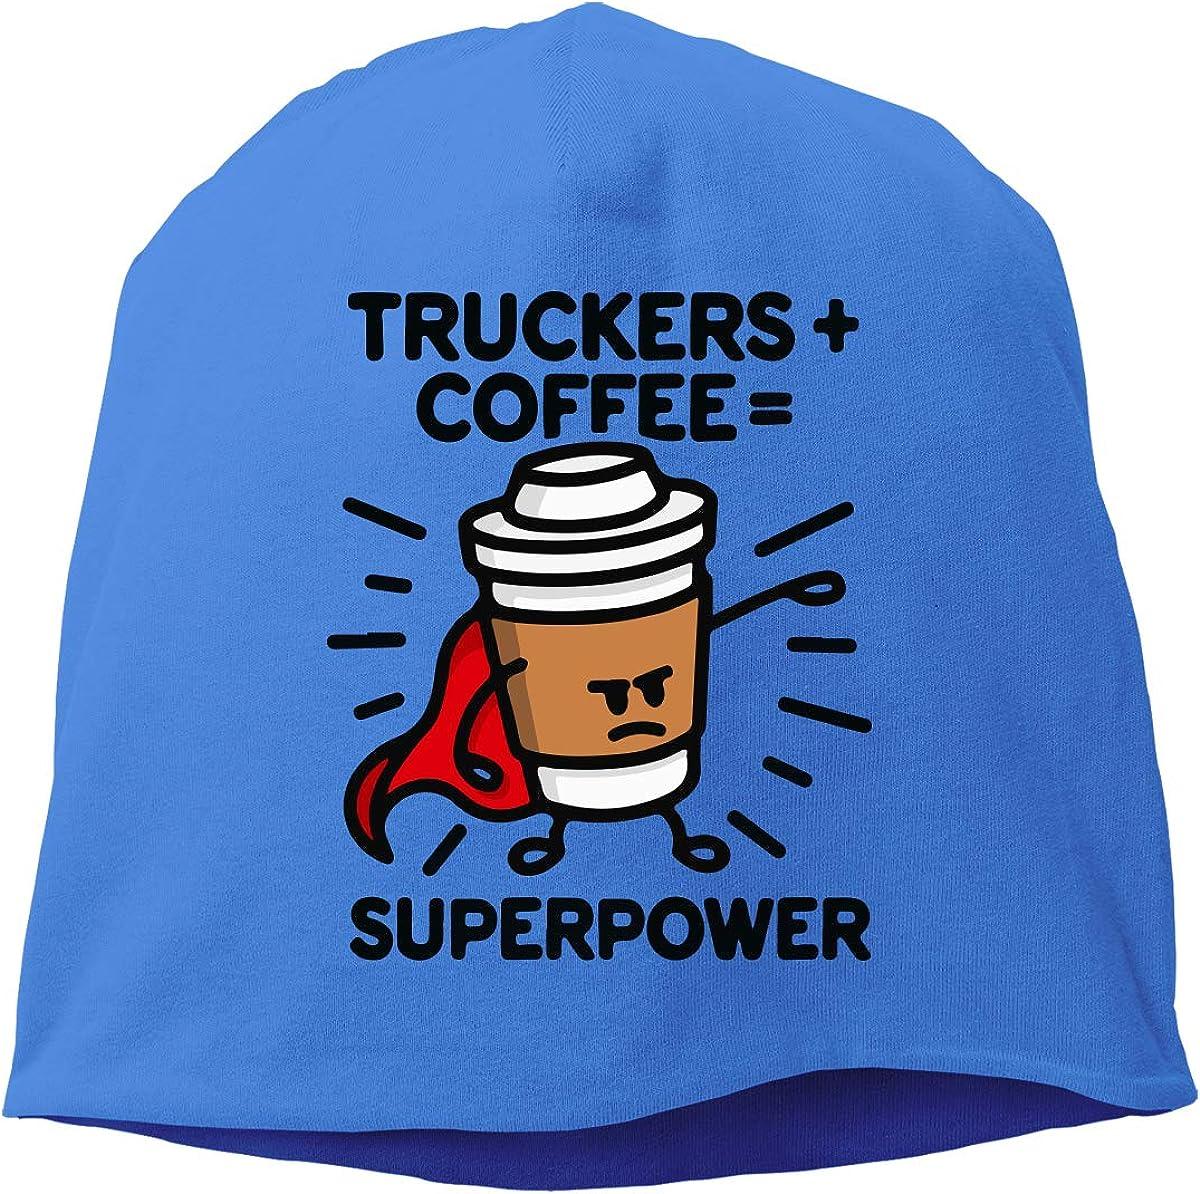 Winter Warm Knit Hat TLPM9LKMBM Truckers Coffee Beanie Skull Cap for Women and Men